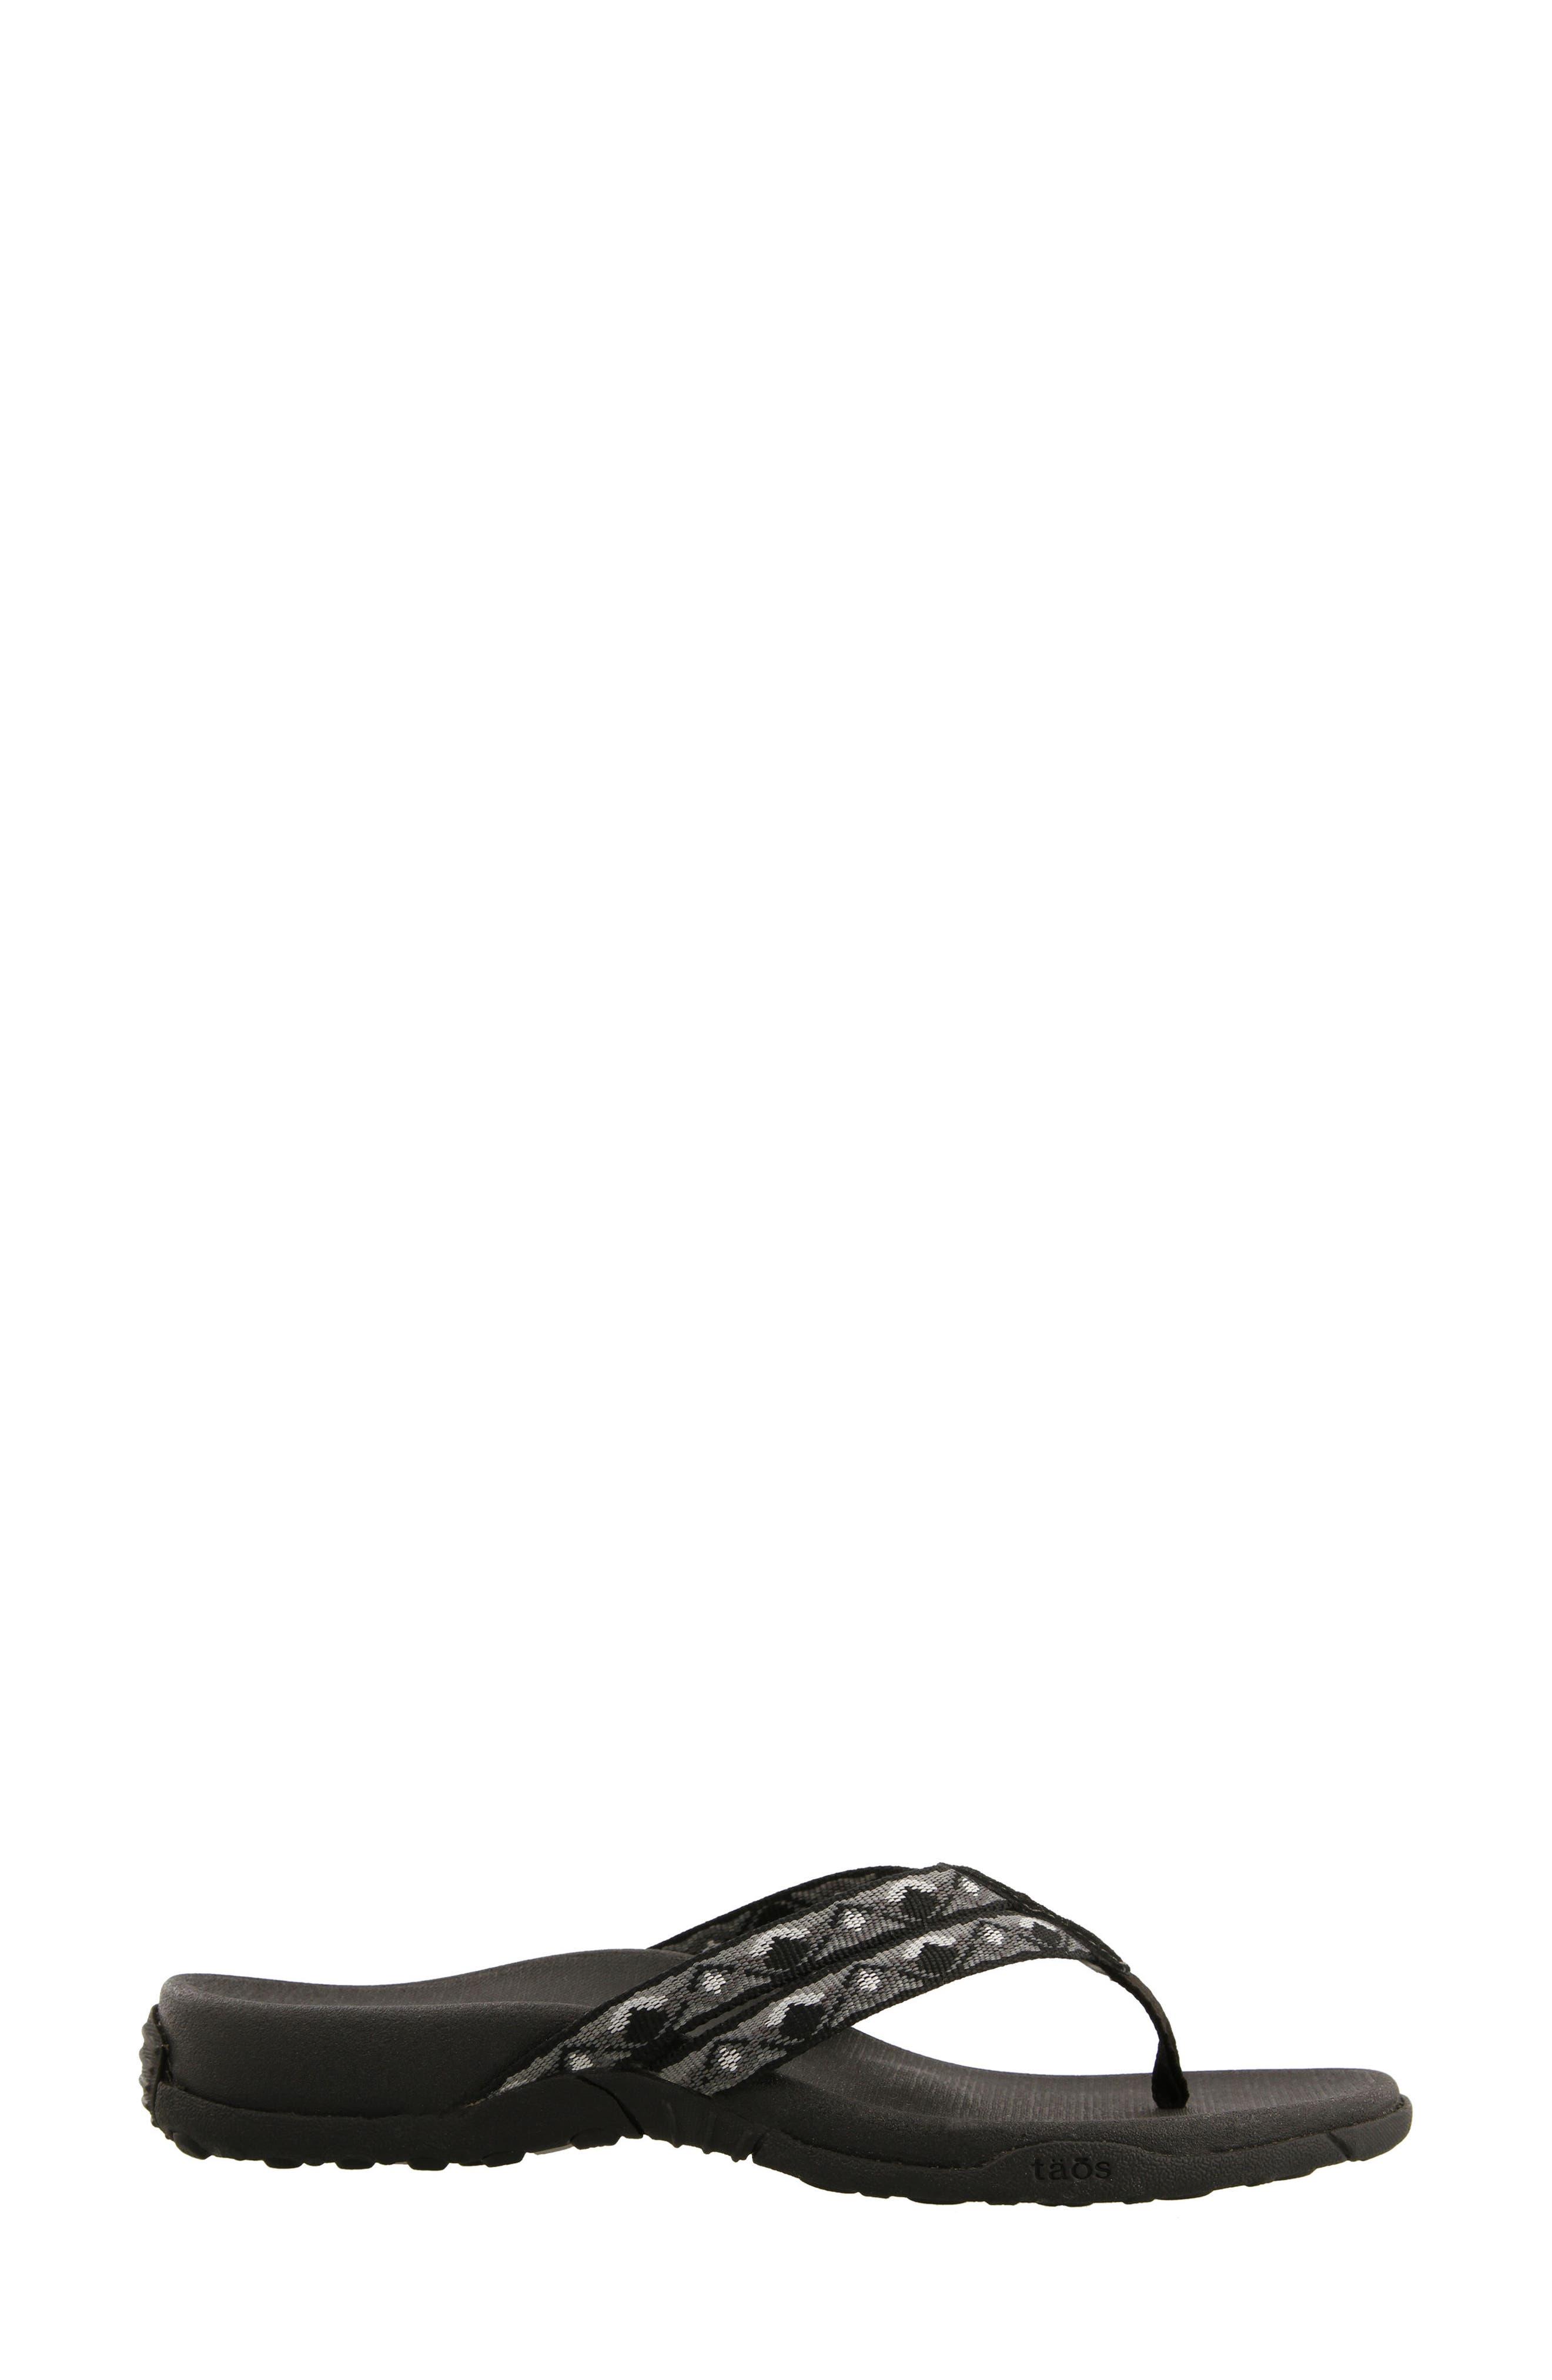 Primo Flip Flop,                             Alternate thumbnail 2, color,                             BLACK/ WHITE FABRIC